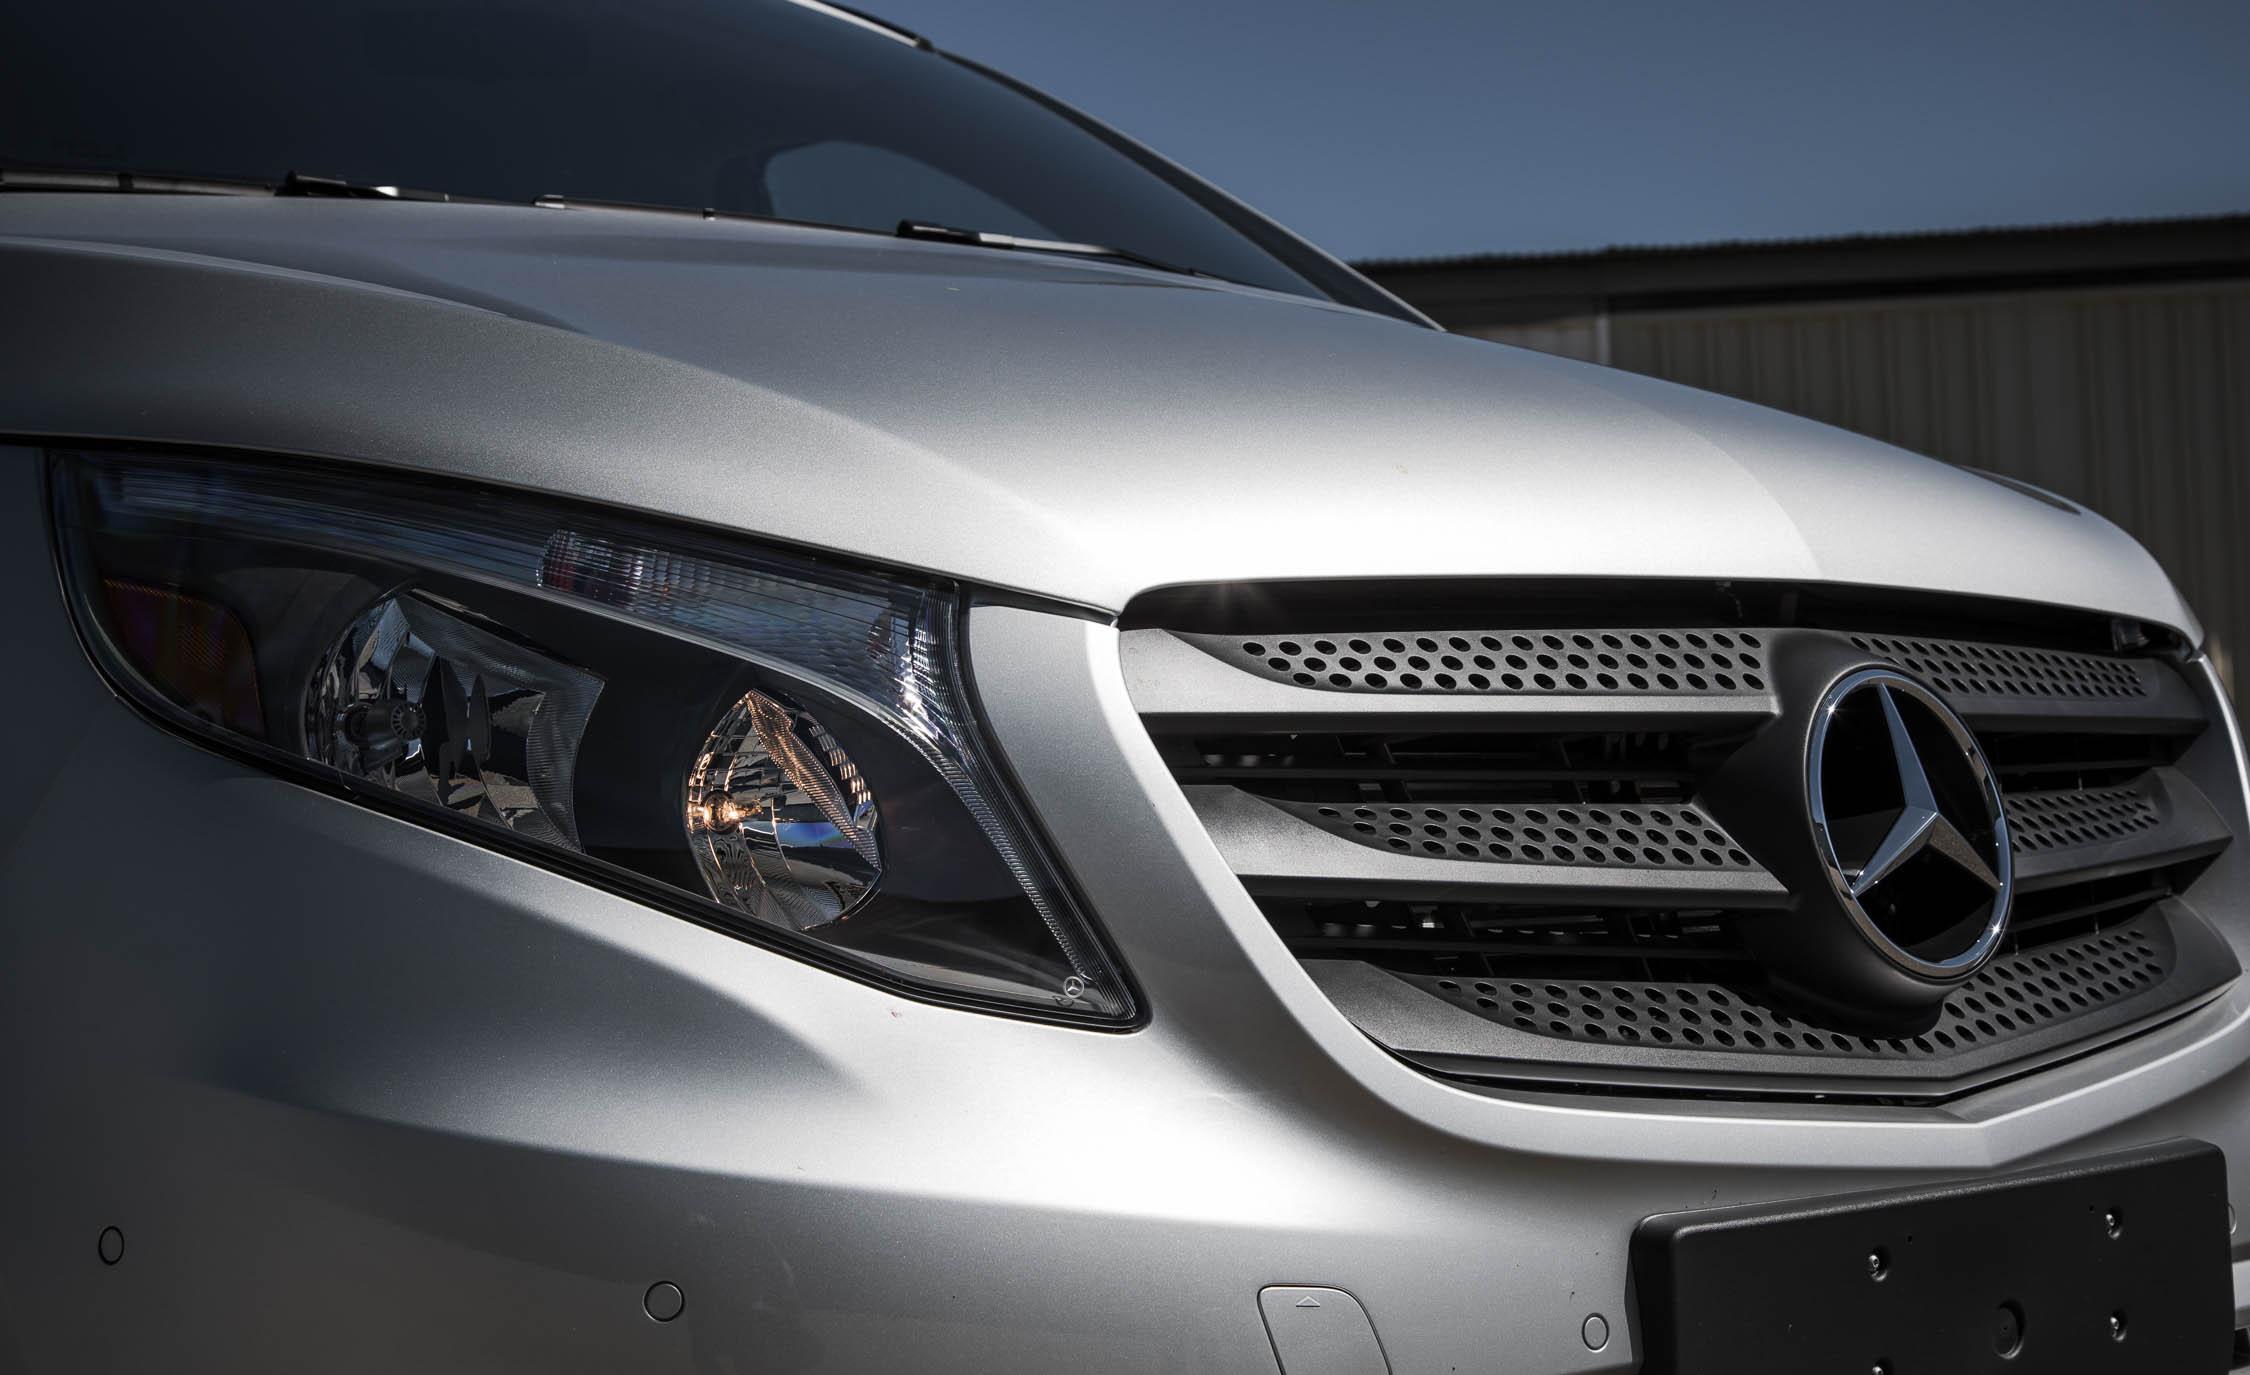 2016 Mercedes-Benz Metris Exterior Grille and Headlight